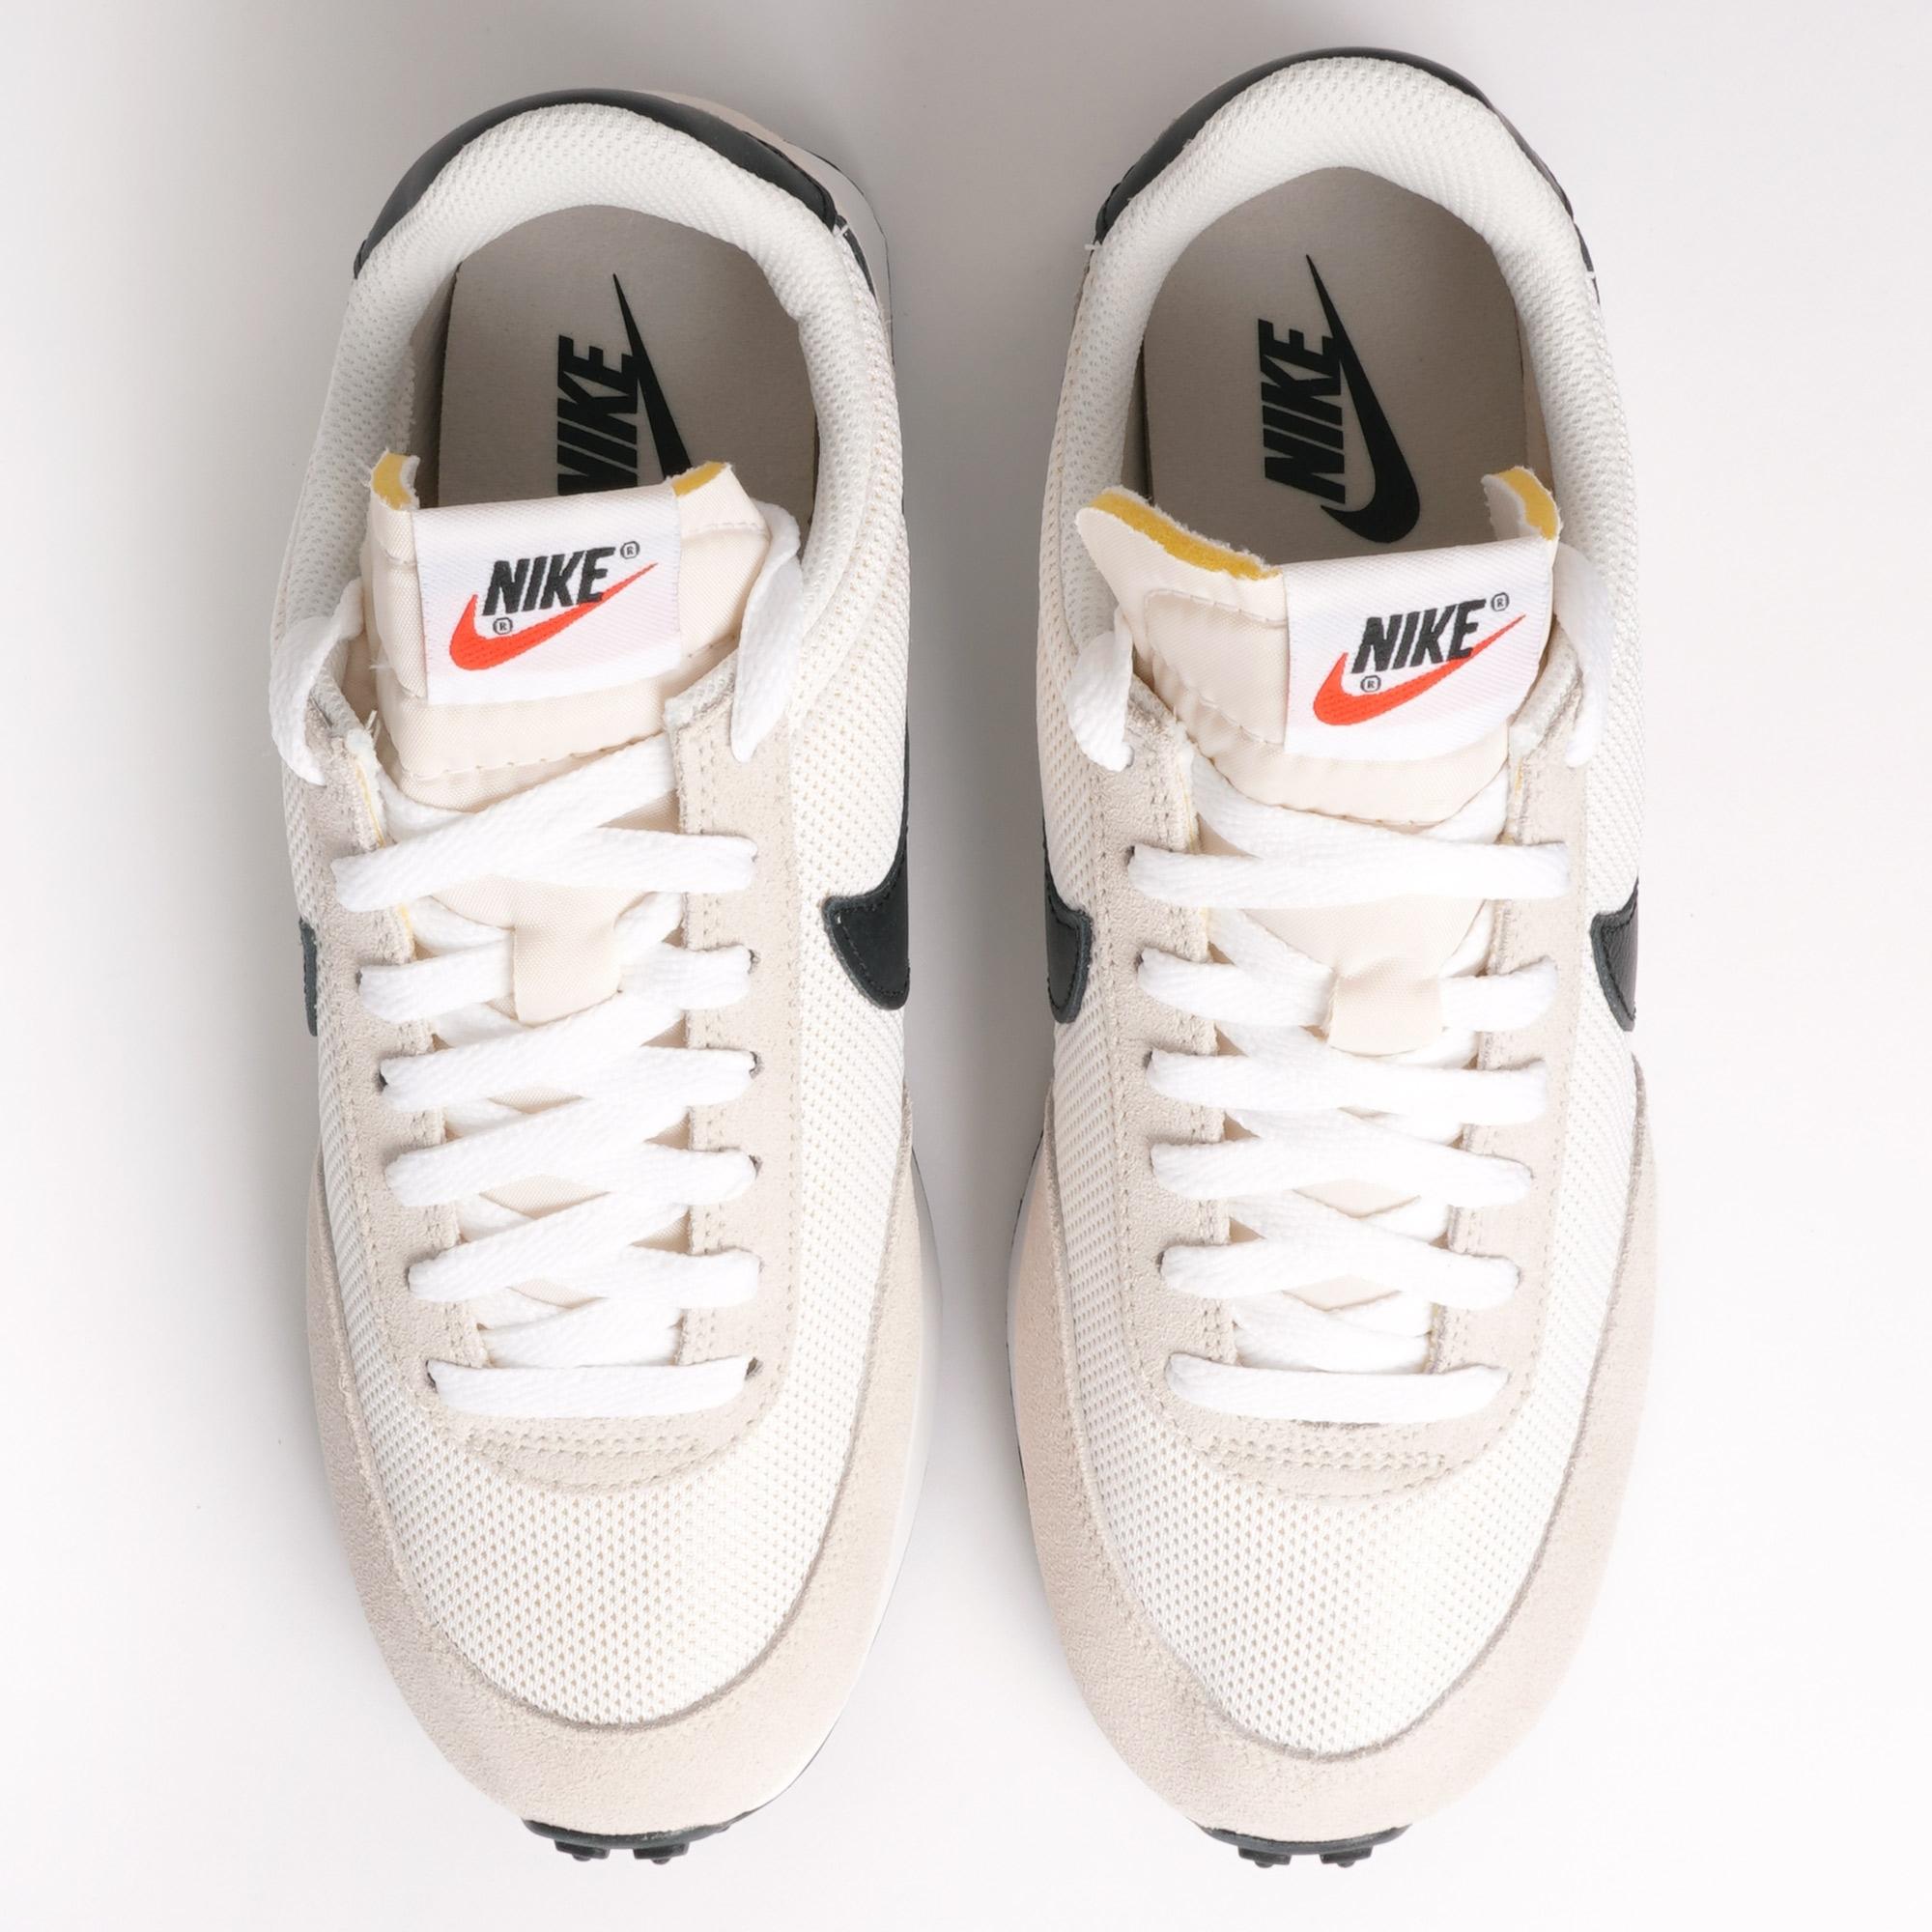 3fc08015 Nike Air Tailwind 79 (White, Black, Phantom & Dark Grey) at Dandy Fellow